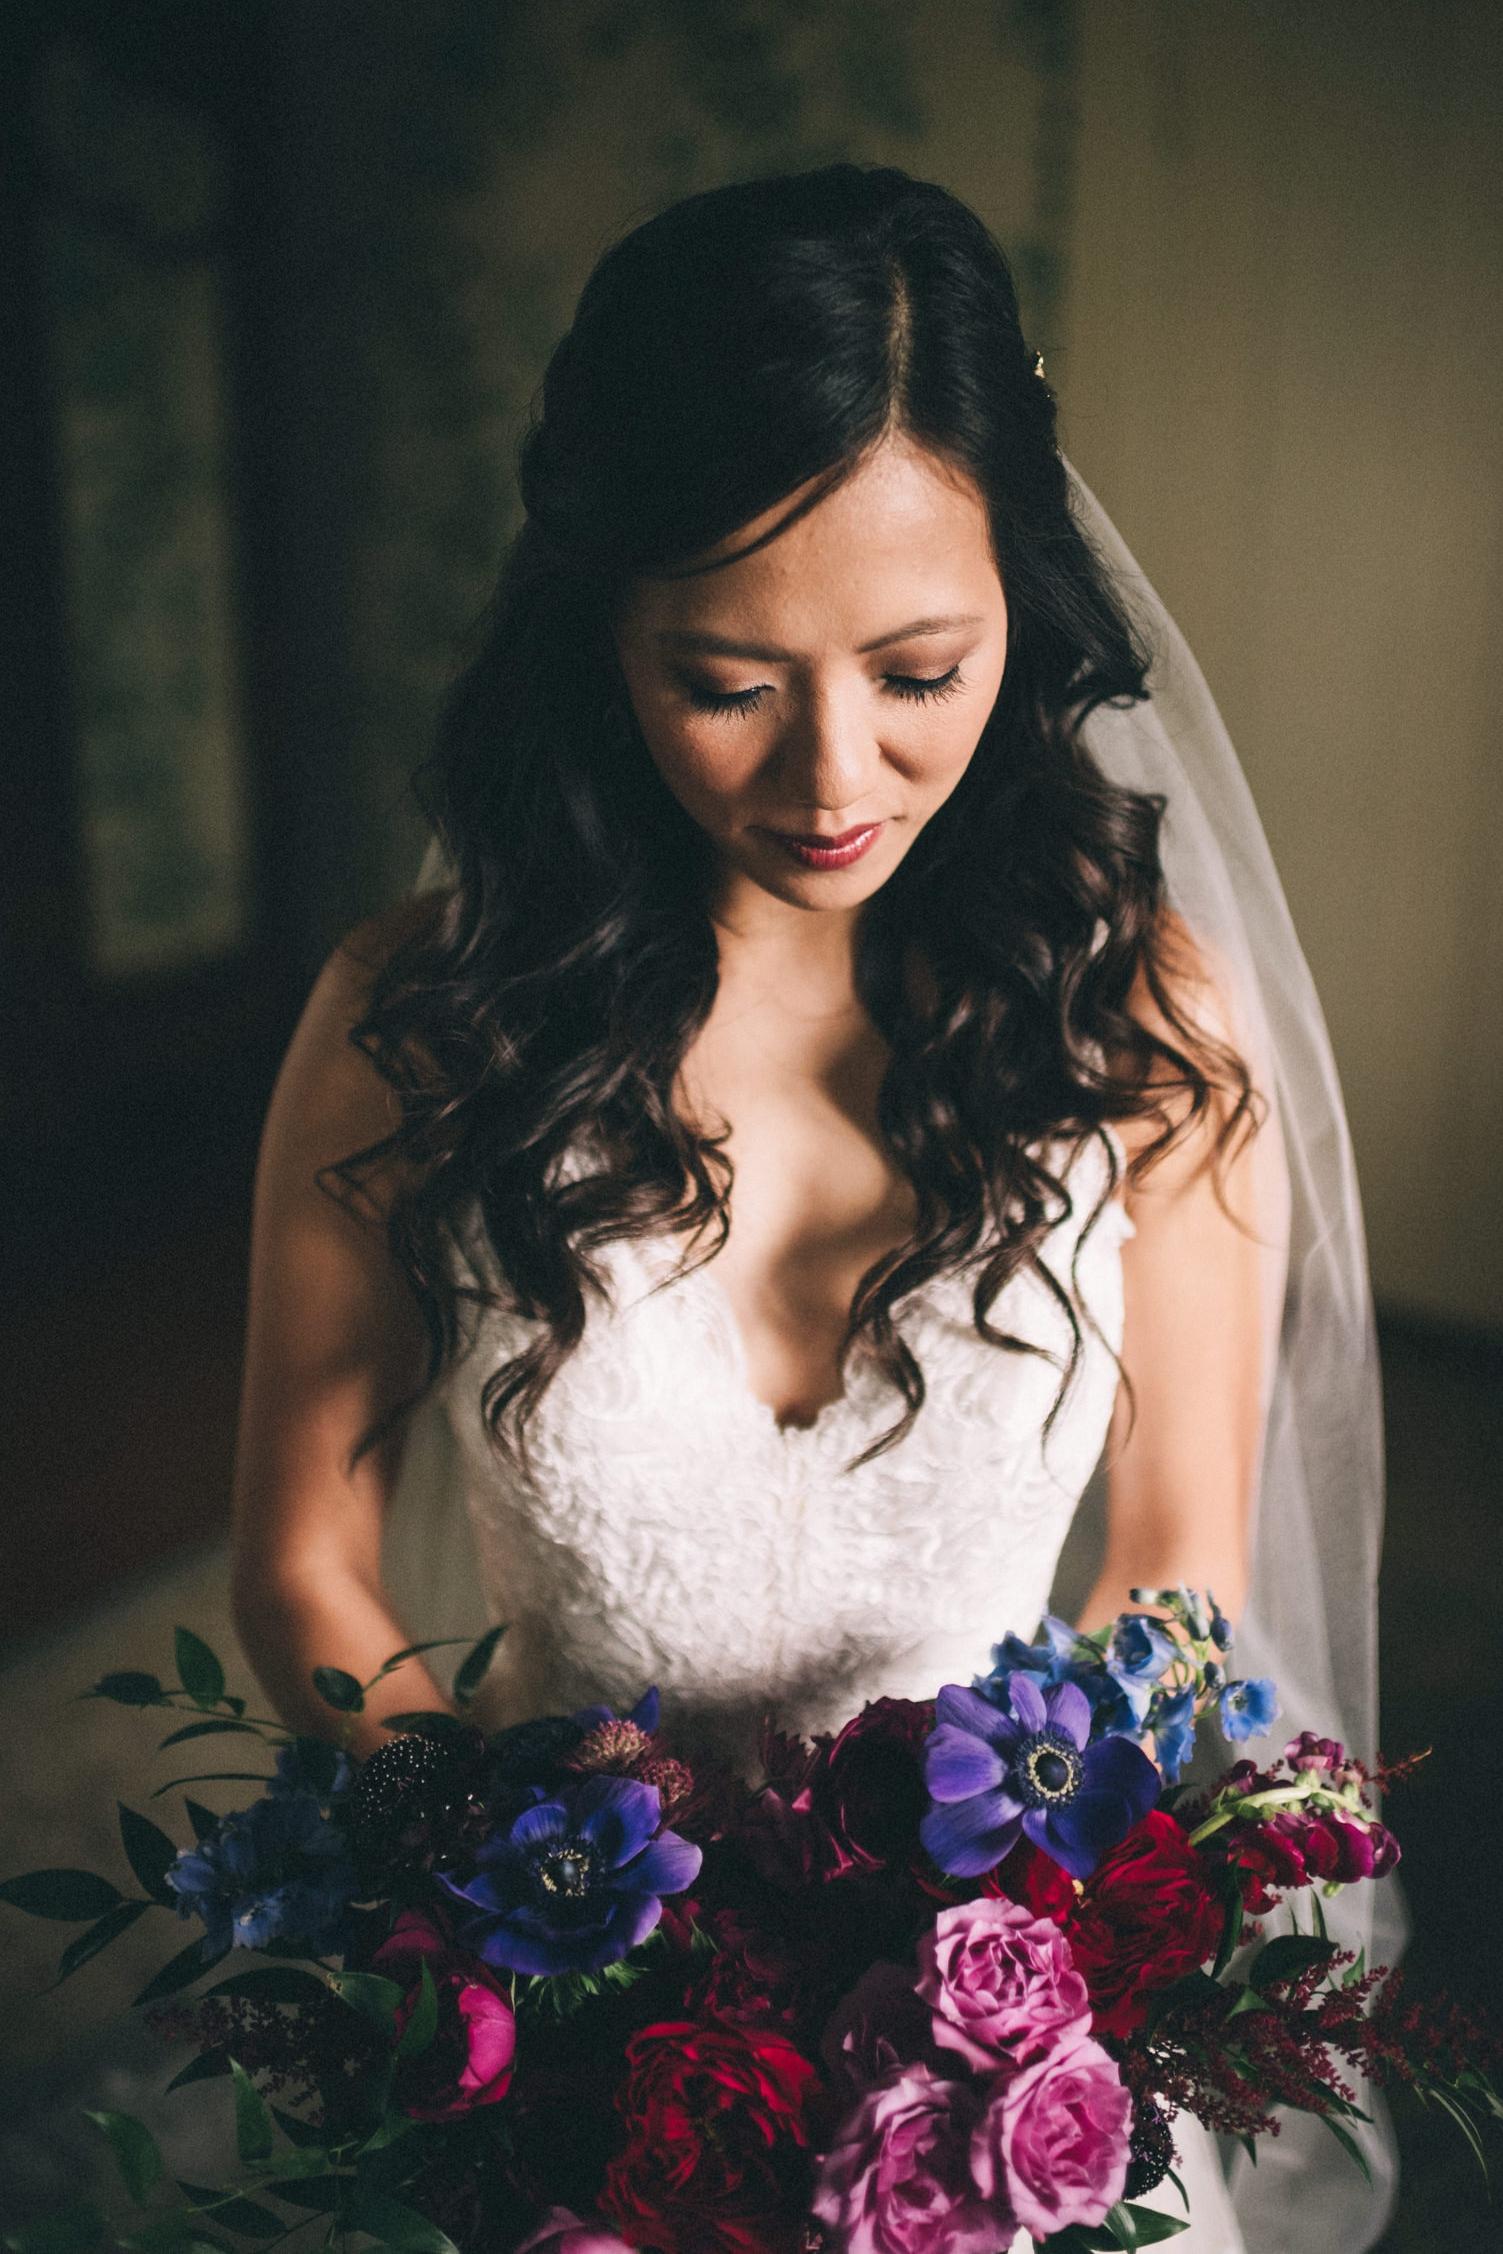 Louisville-Kentucky-Wedding-and-Elopement-Photographer-Sarah-Katherine-Davis-Photography-Summer-Jewel-Toned-Wedding-Chineese-Tea-Ceremony-Warrenwood-Manor-Danville-116.jpg